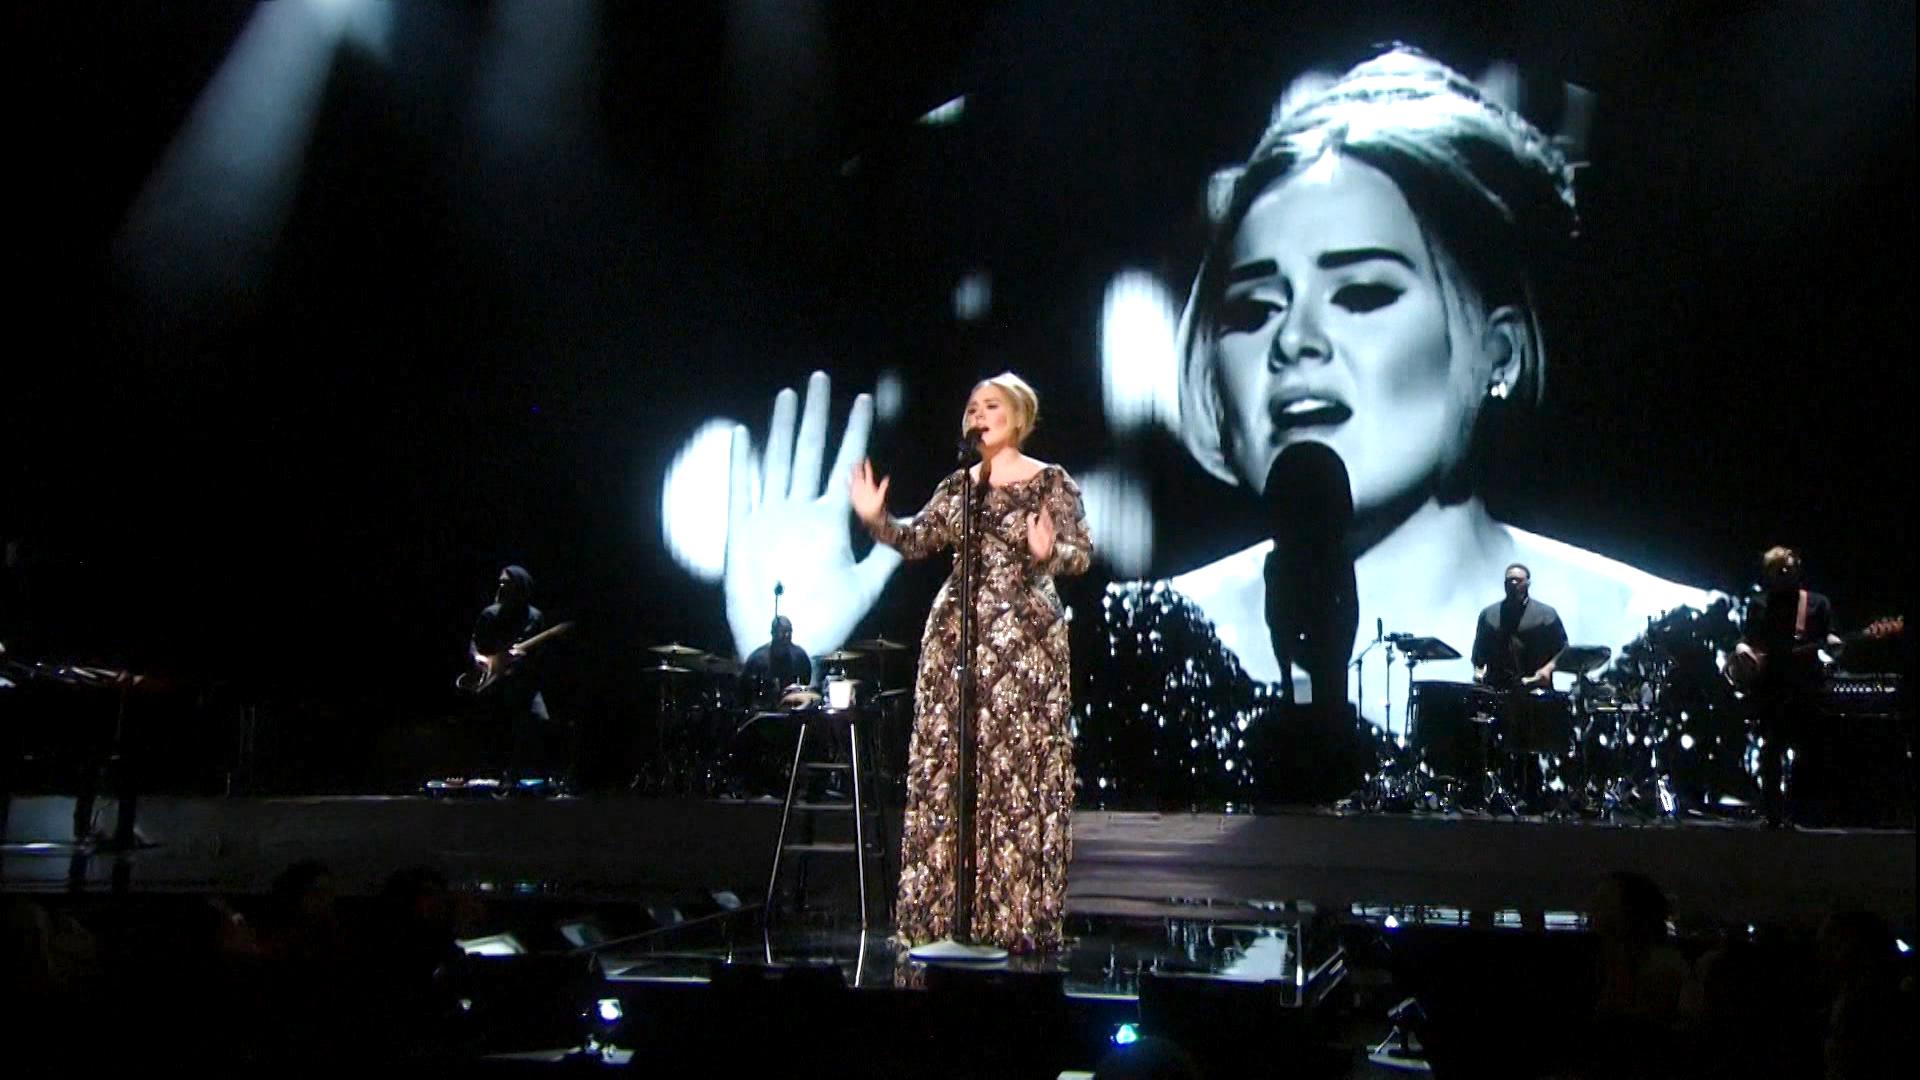 151210_2952285_Adele_Live_in_New_York_City.jpg